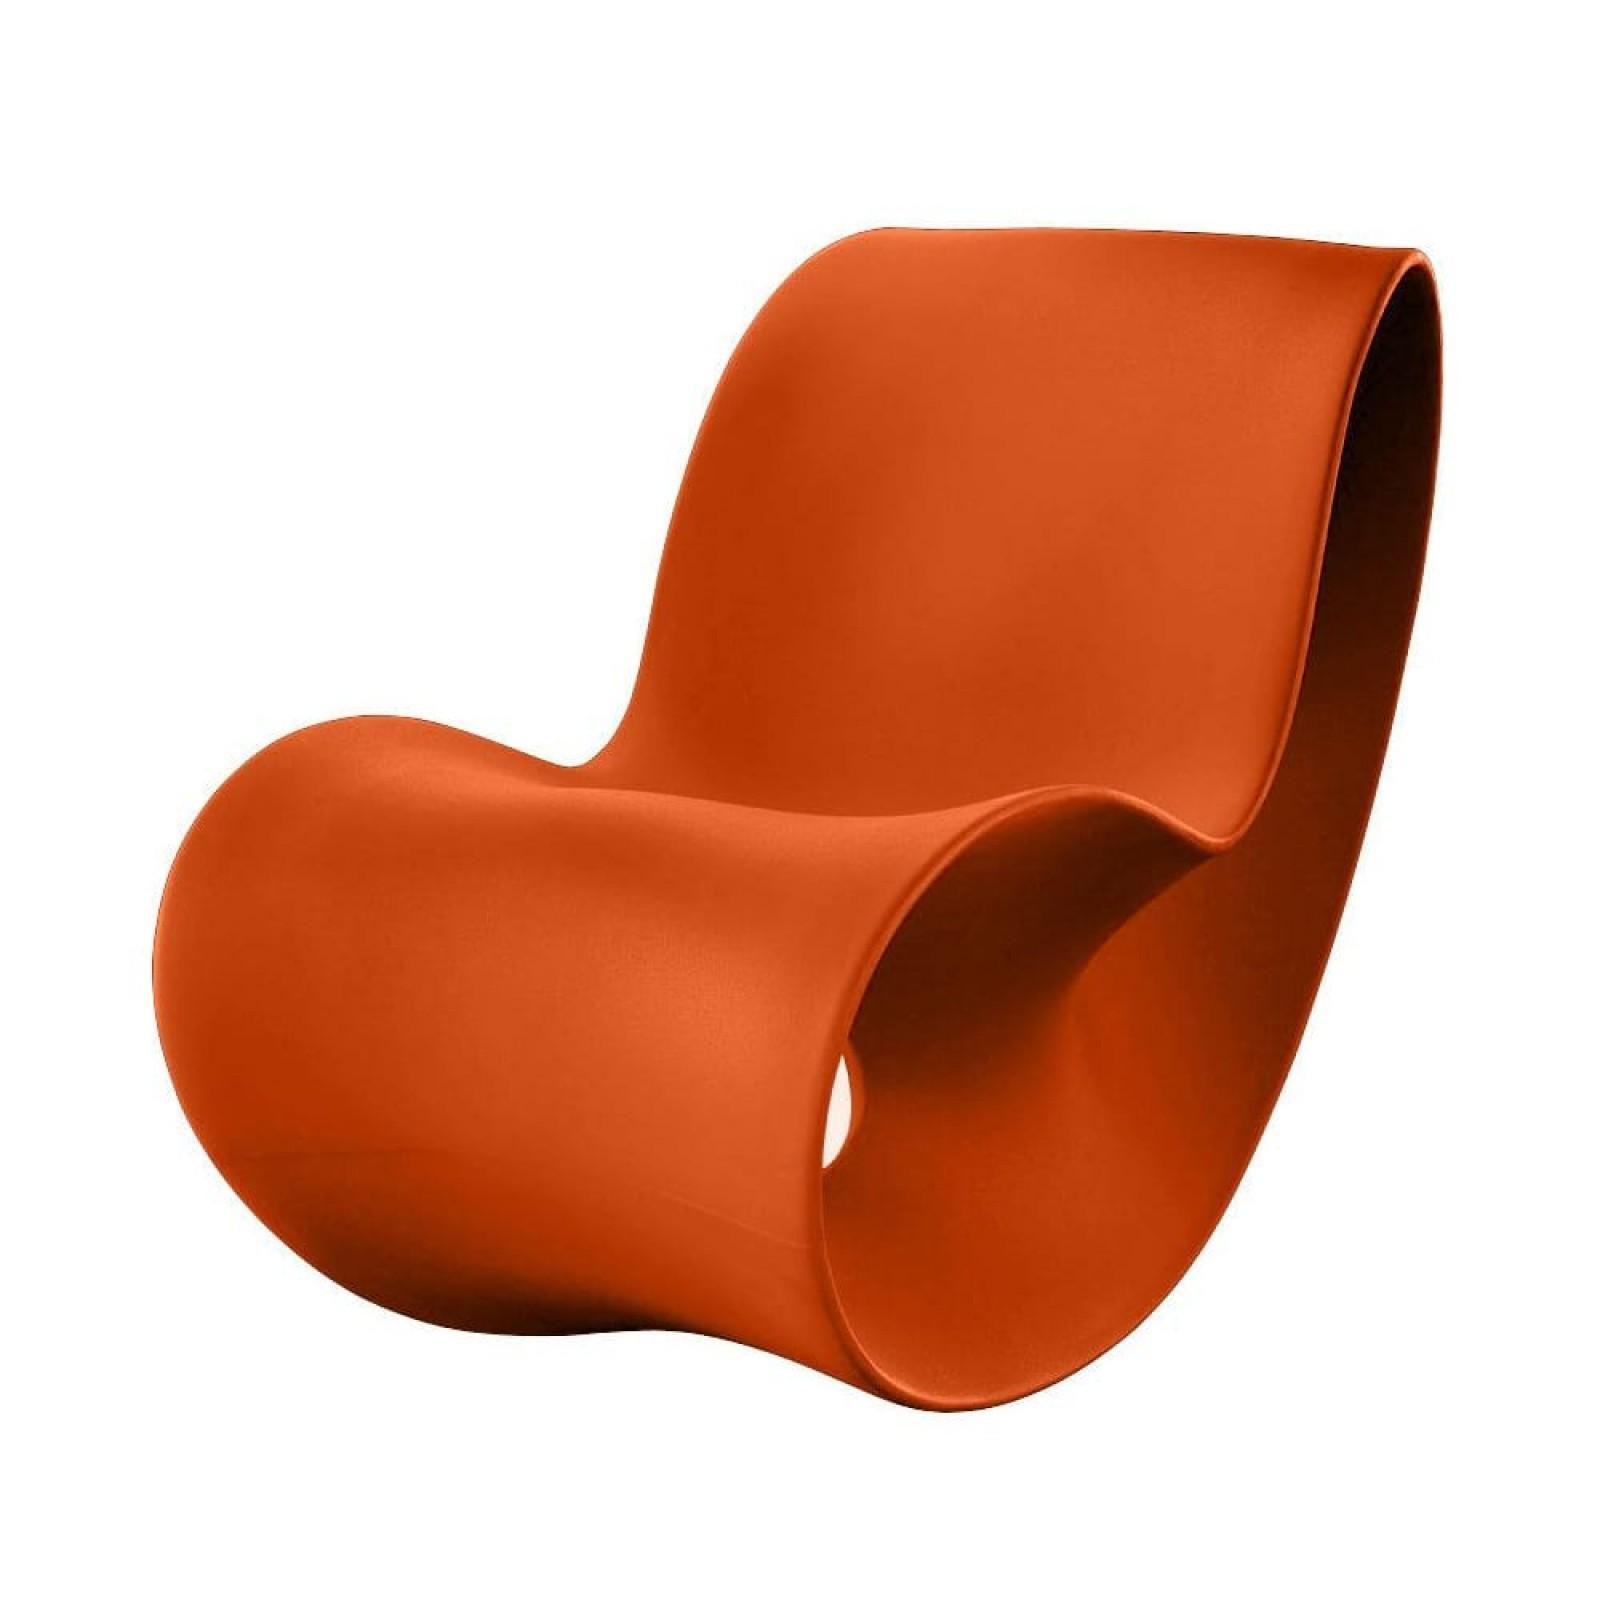 Voido Rocking Chair (Orange) - Magis